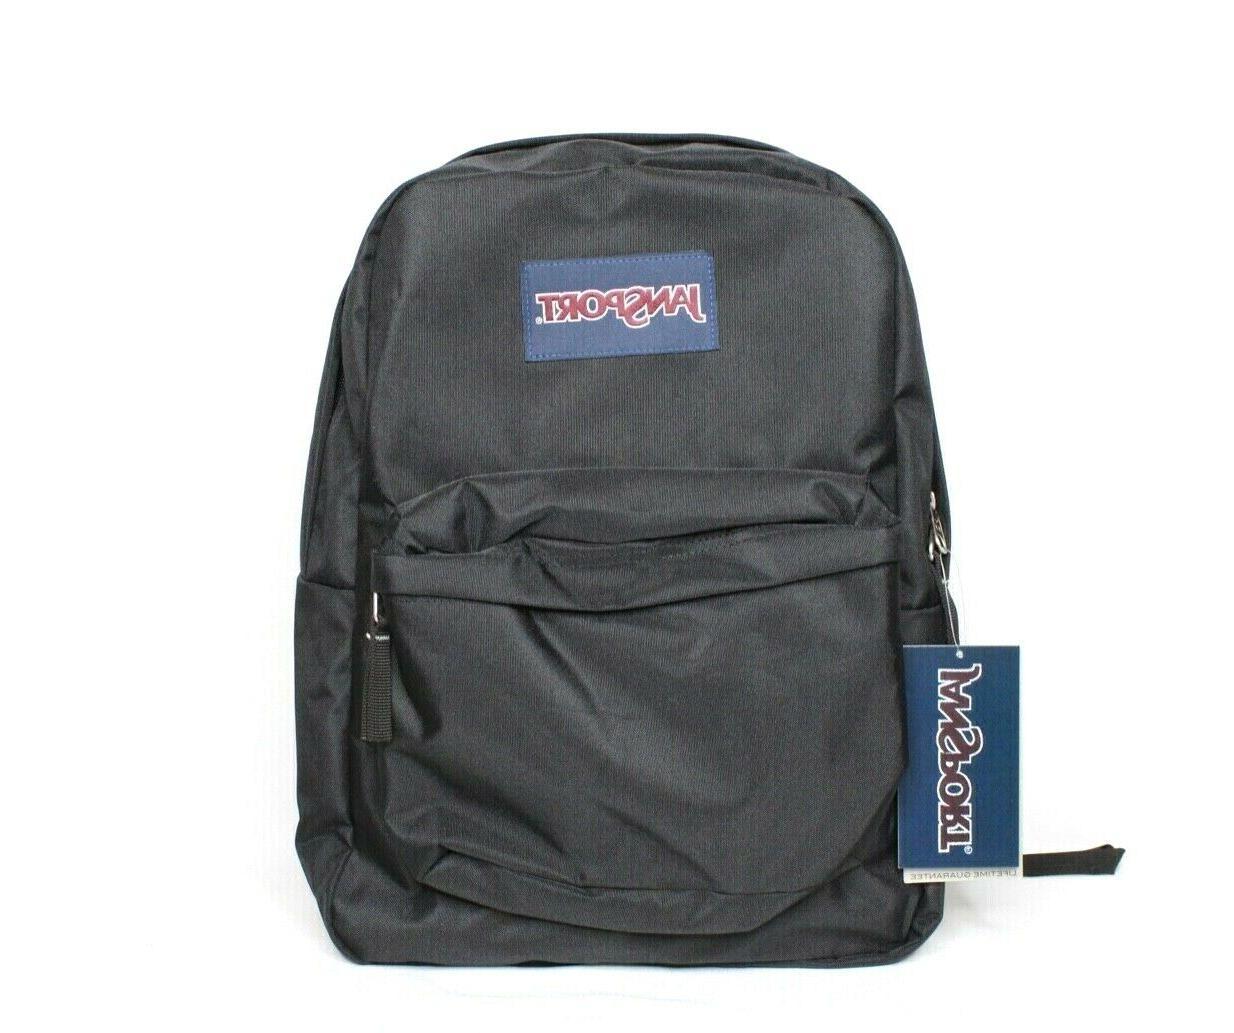 super break black bagpack js00t501008 nwt